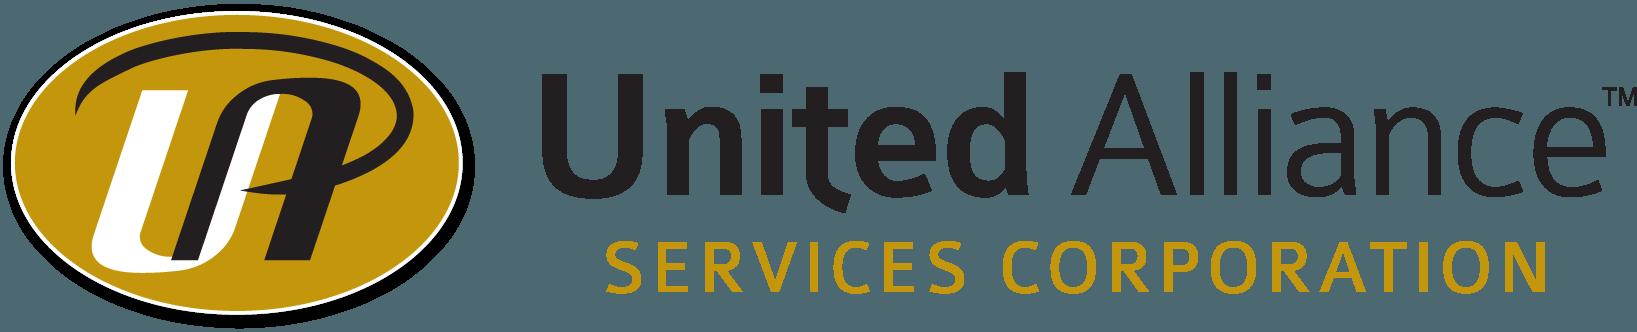 United Alliance services corporation.